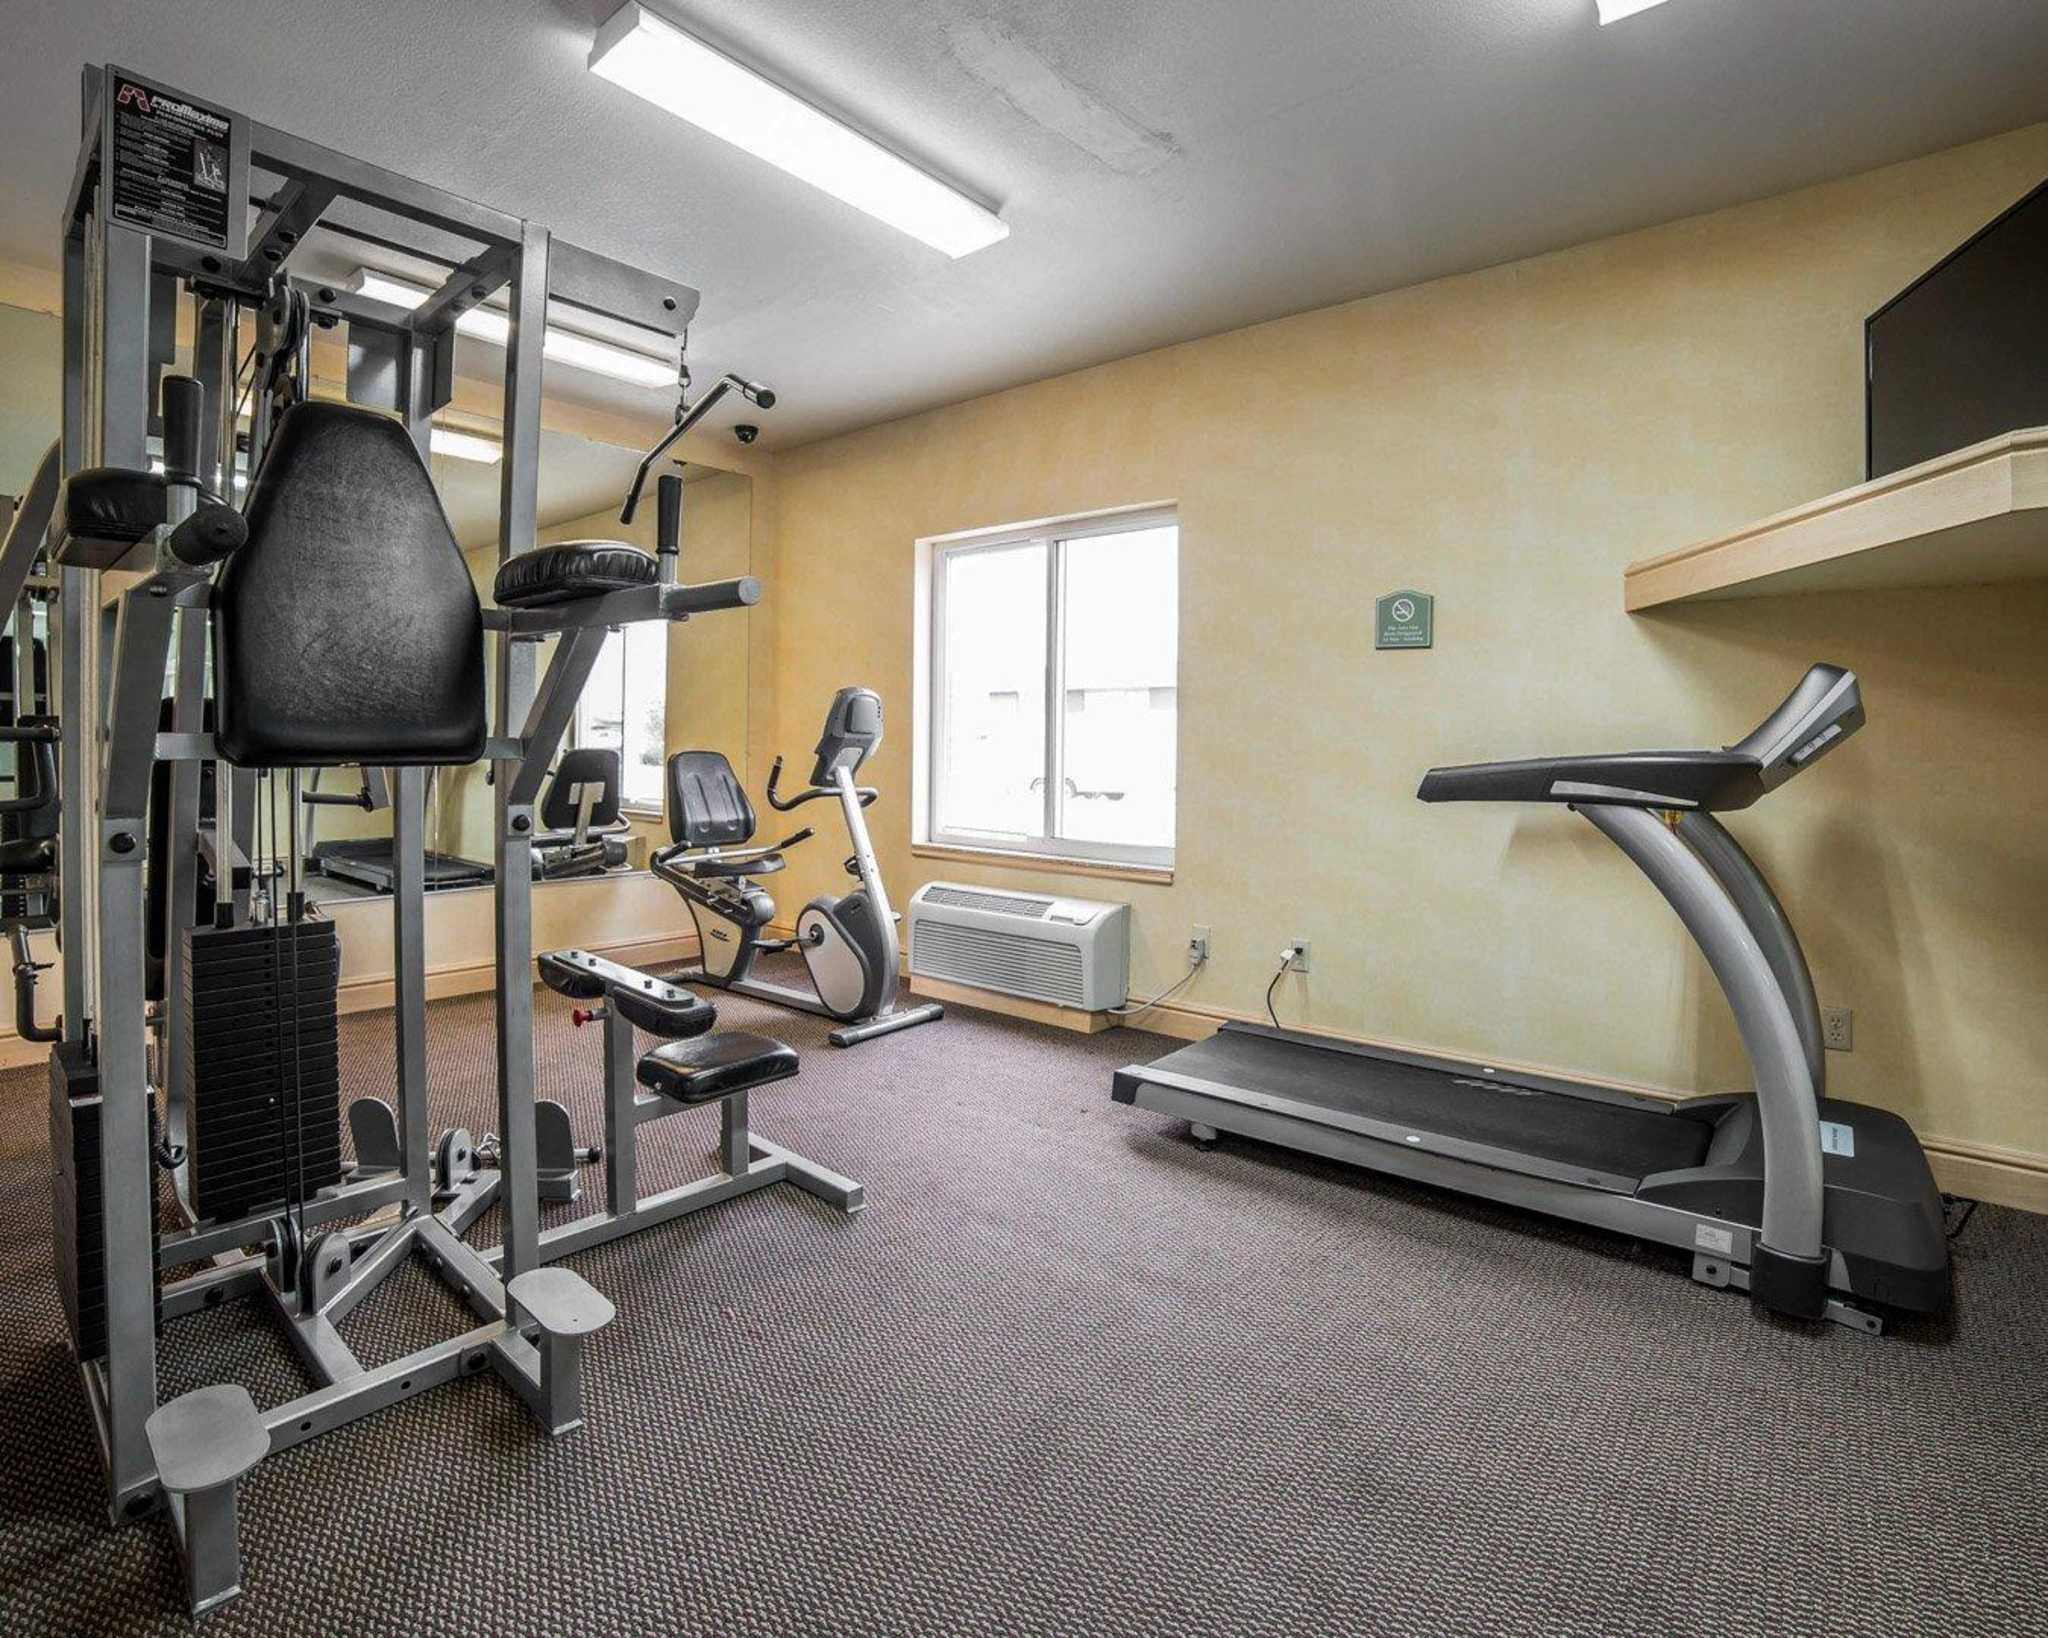 Comfort Inn & Suites image 23